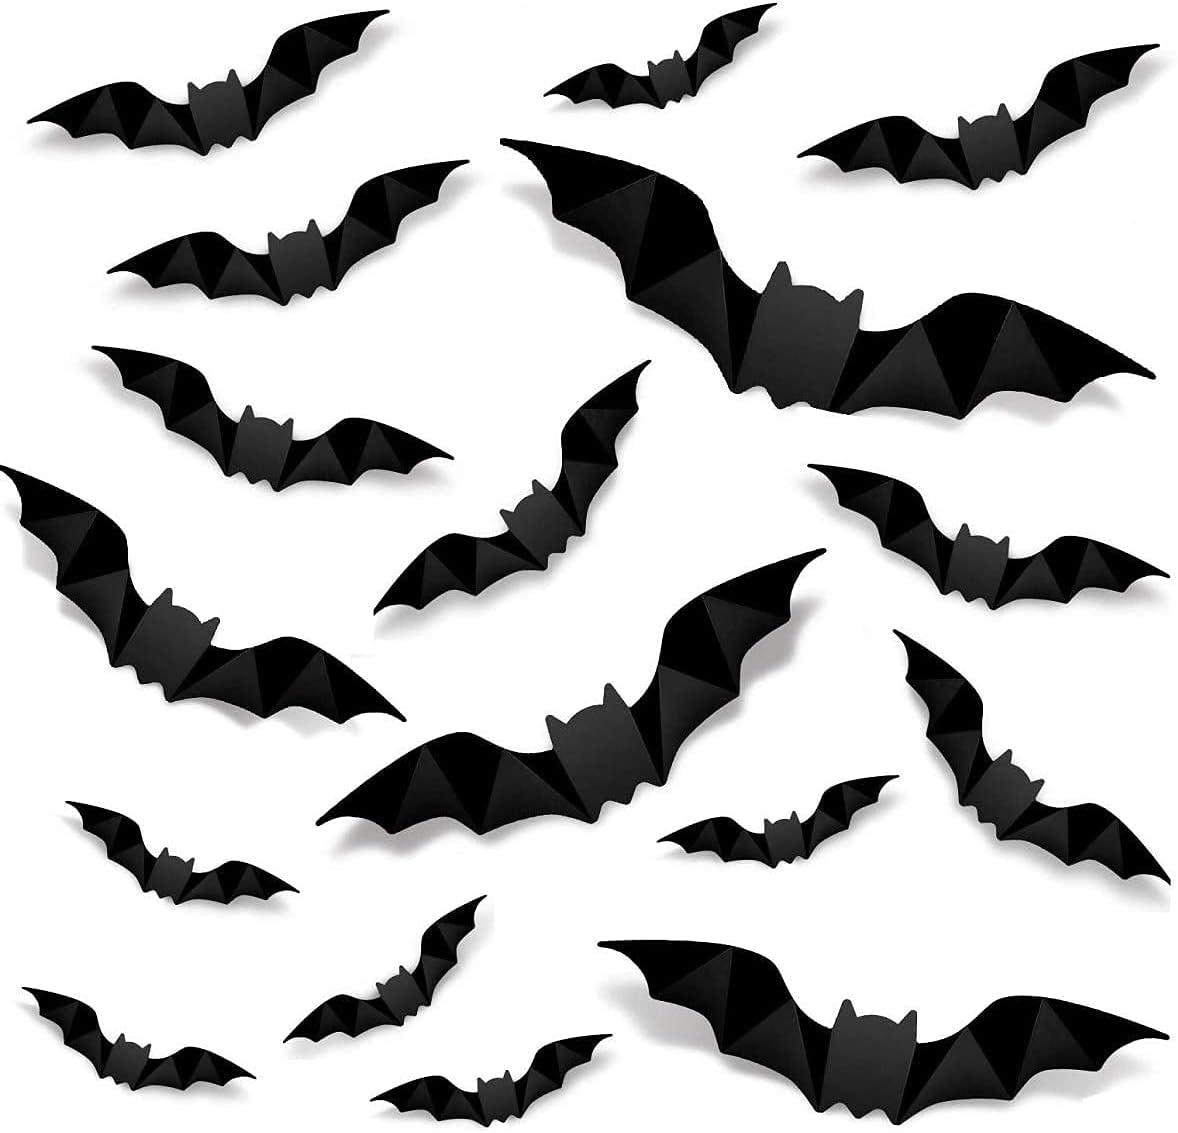 Halloween Decorations 3D Bat Decorations,80PCS DIY Scary Window Bats Window Decal Window Stickers ,Halloween Party Decoration Supplies